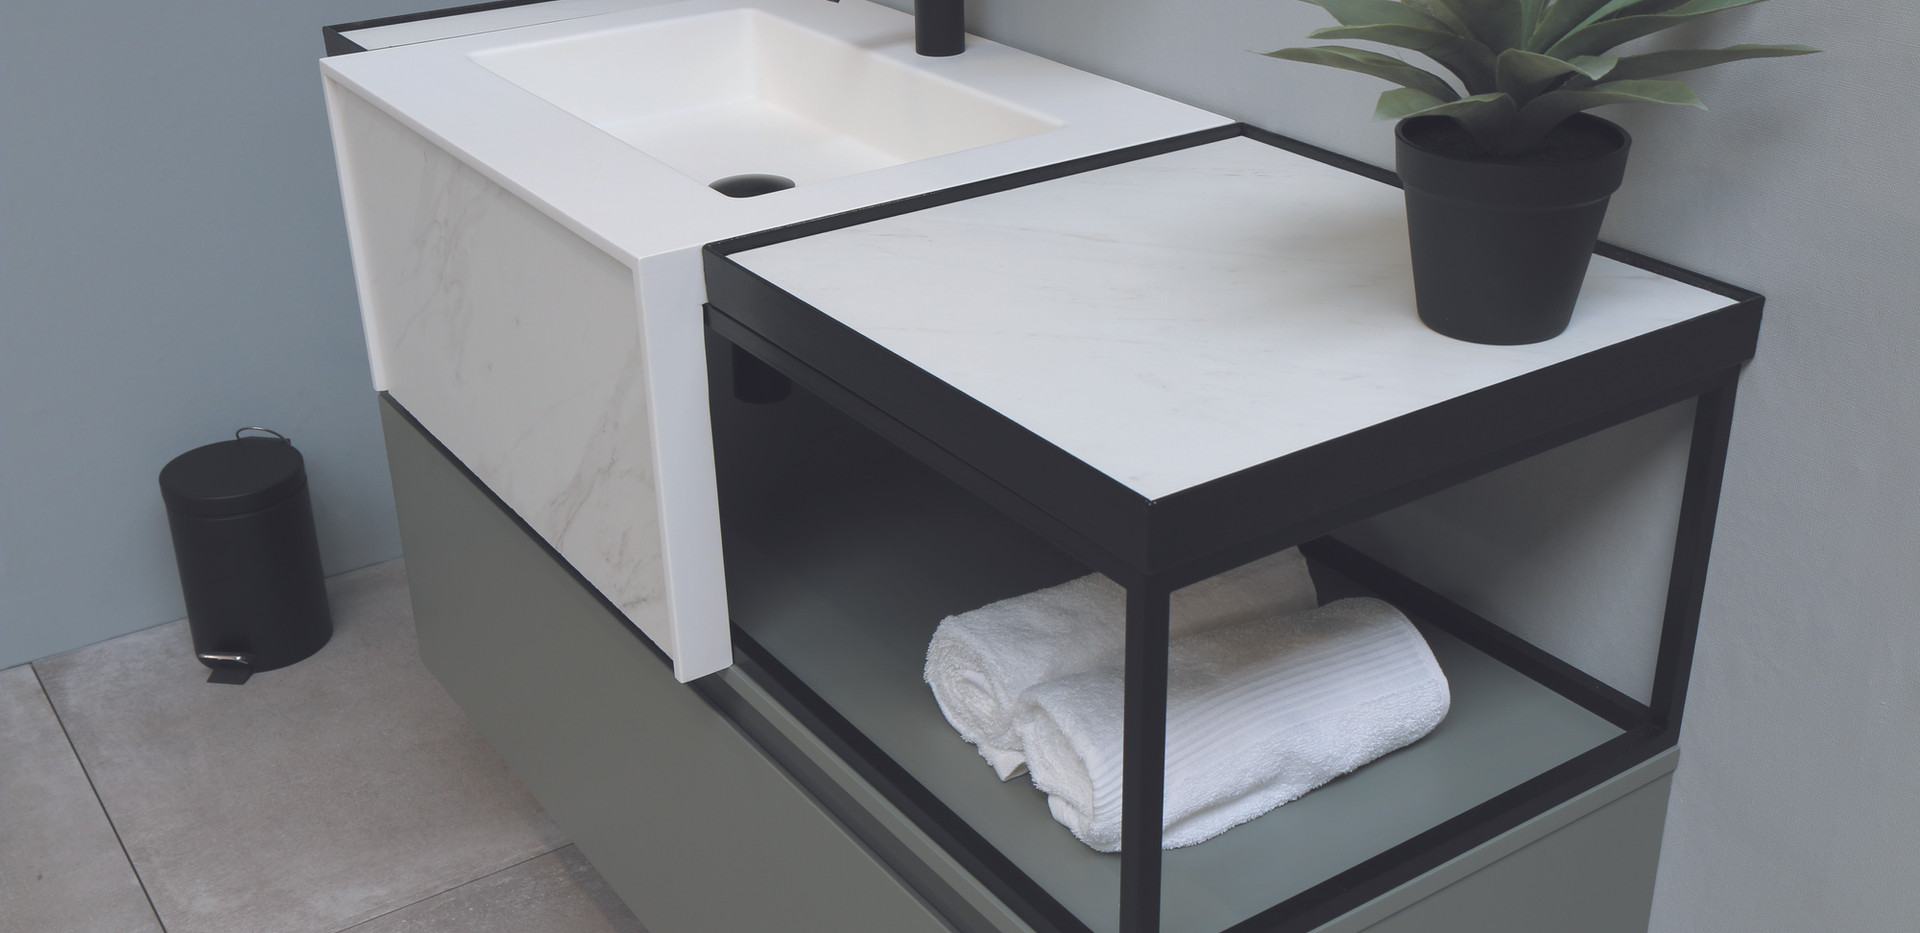 Tilo met ferro frame - wastafel(1).jpg